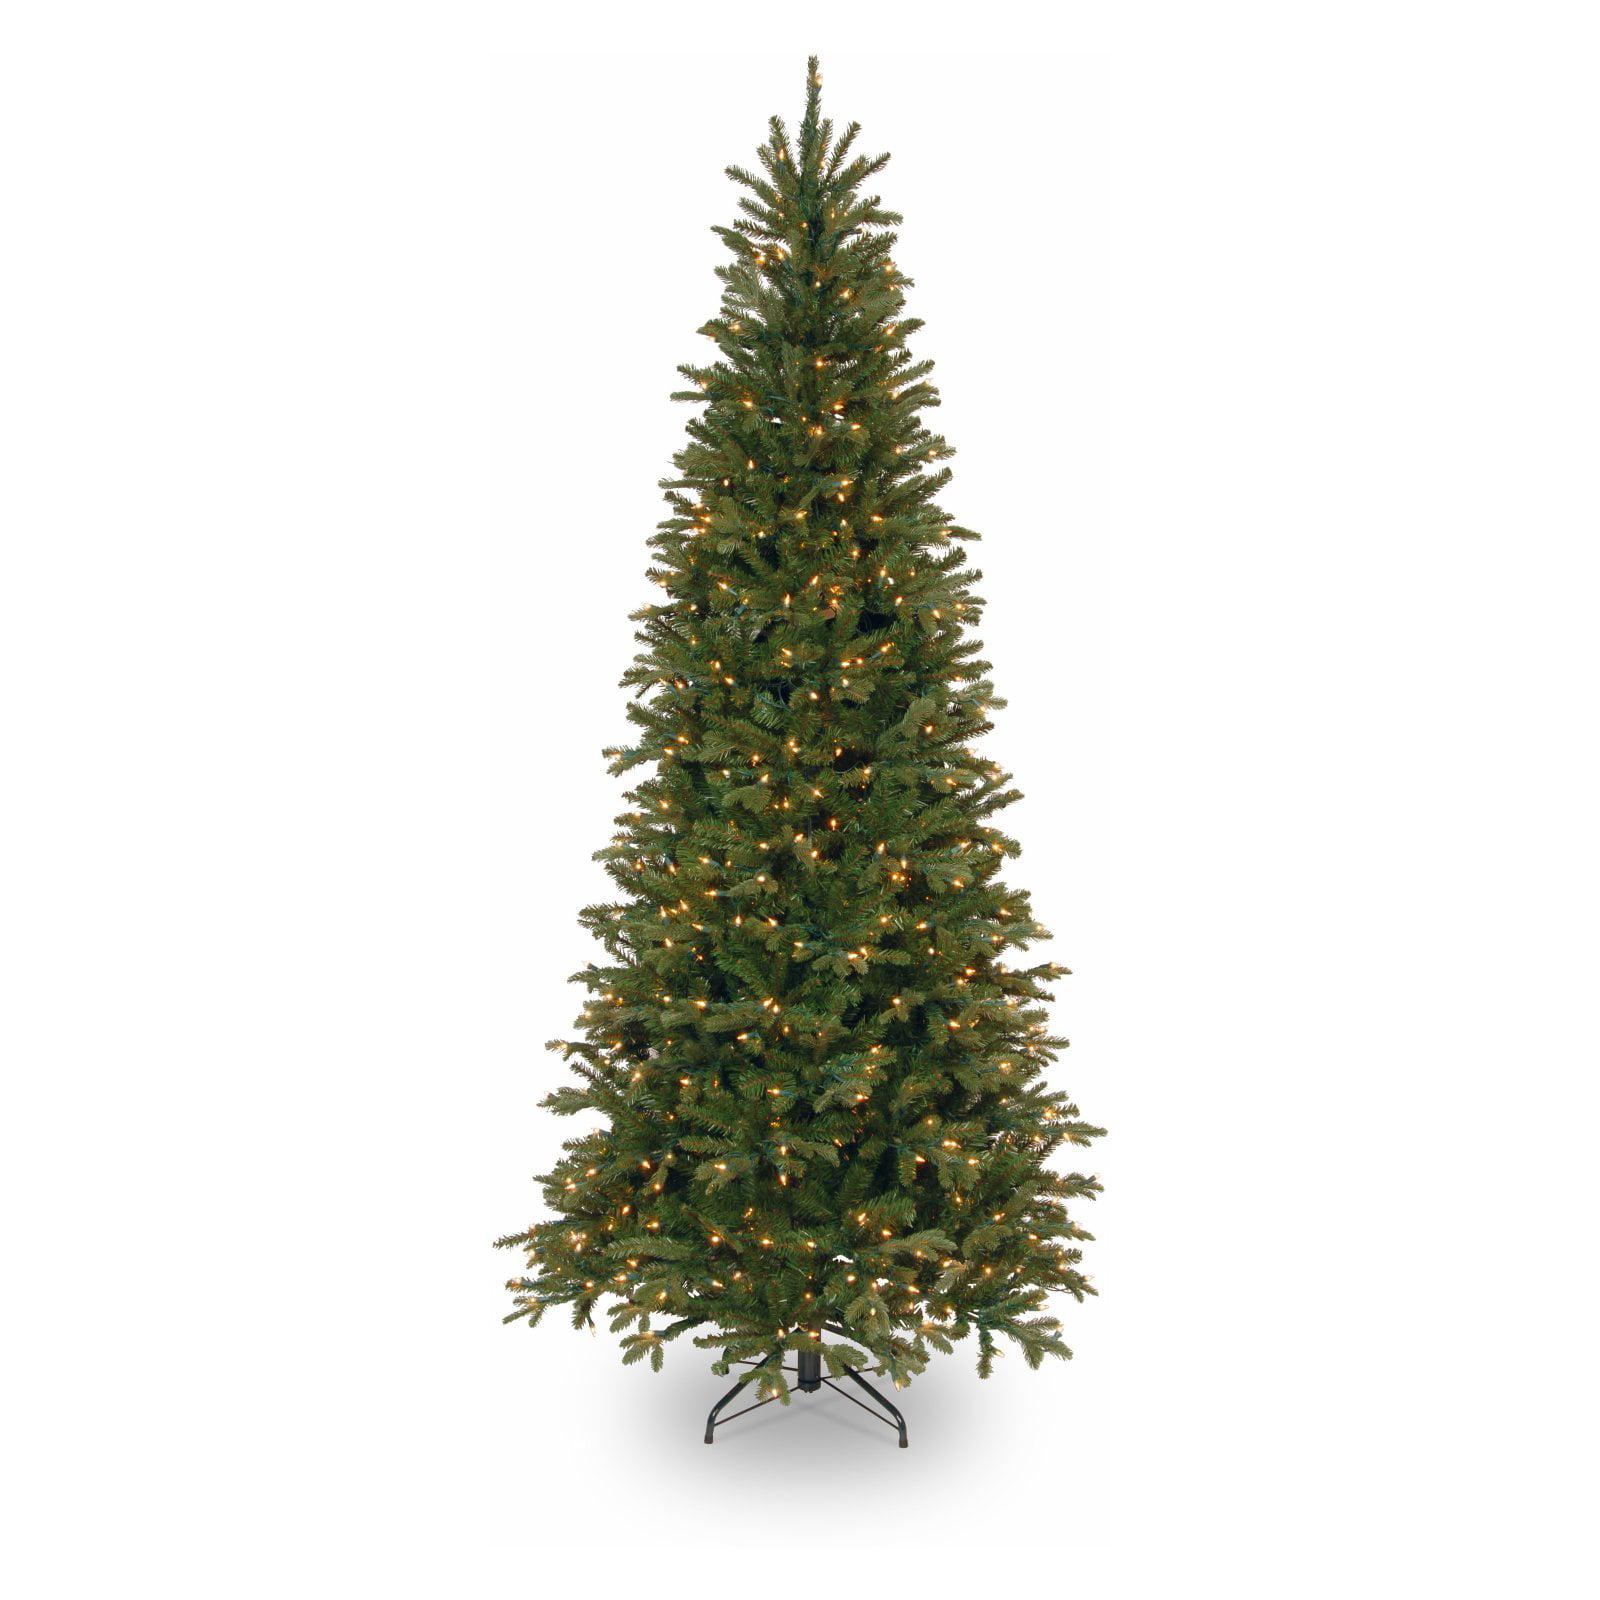 03101ec20 National Tree Pre-Lit 9  Feel-Real Tiffany Fir Slim Hinged Artificial  Christmas Tree with 800 Clear Lights - Walmart.com